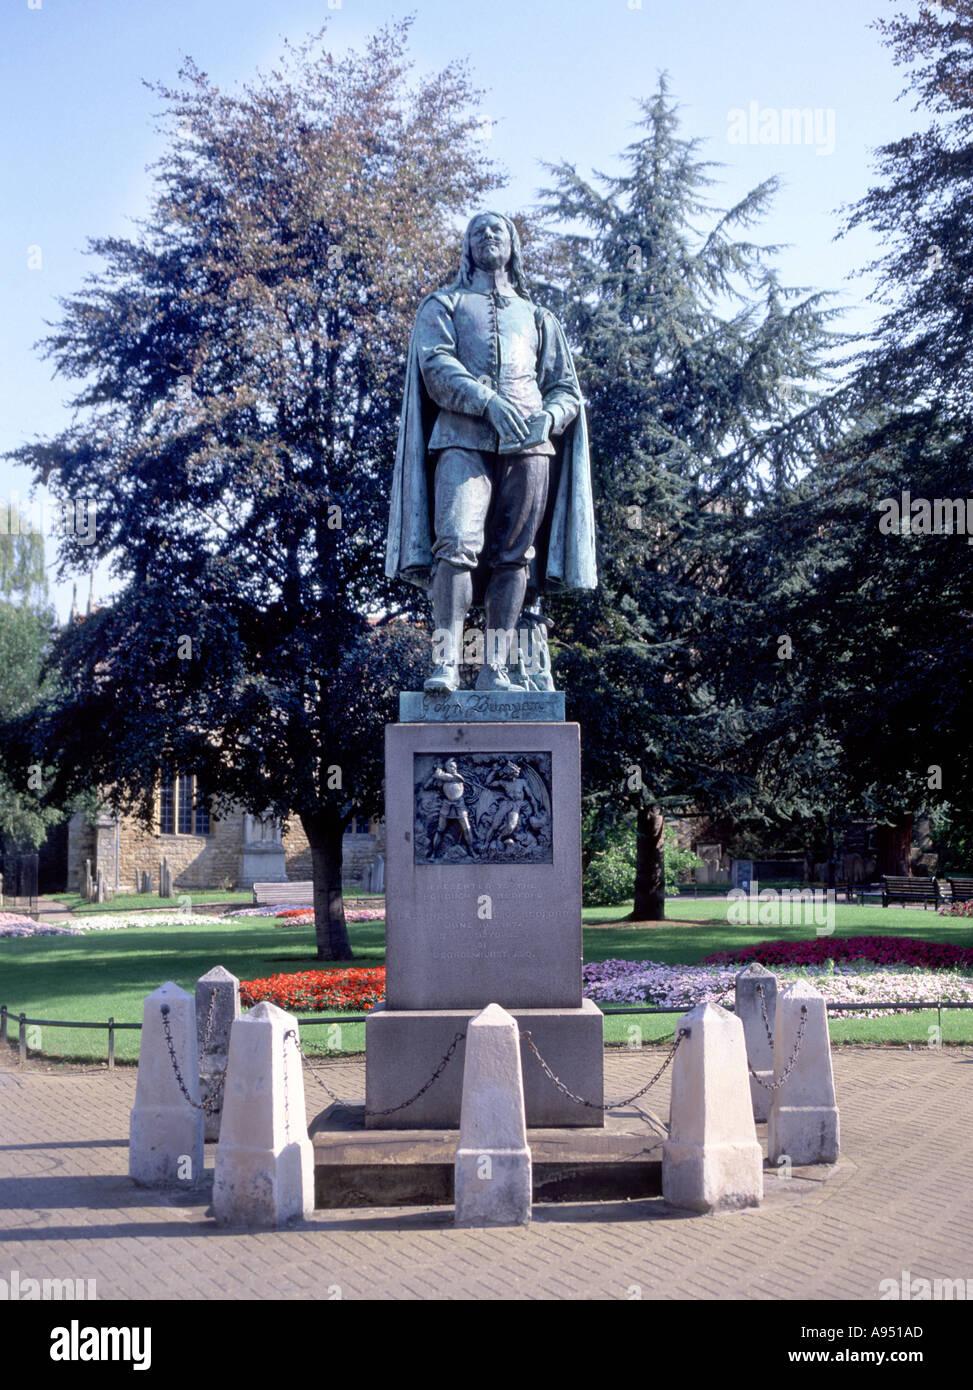 Bedford statue of John Bunyan writer Puritan minister author of The Pilgrim s Progress renowned religious allegories - Stock Image